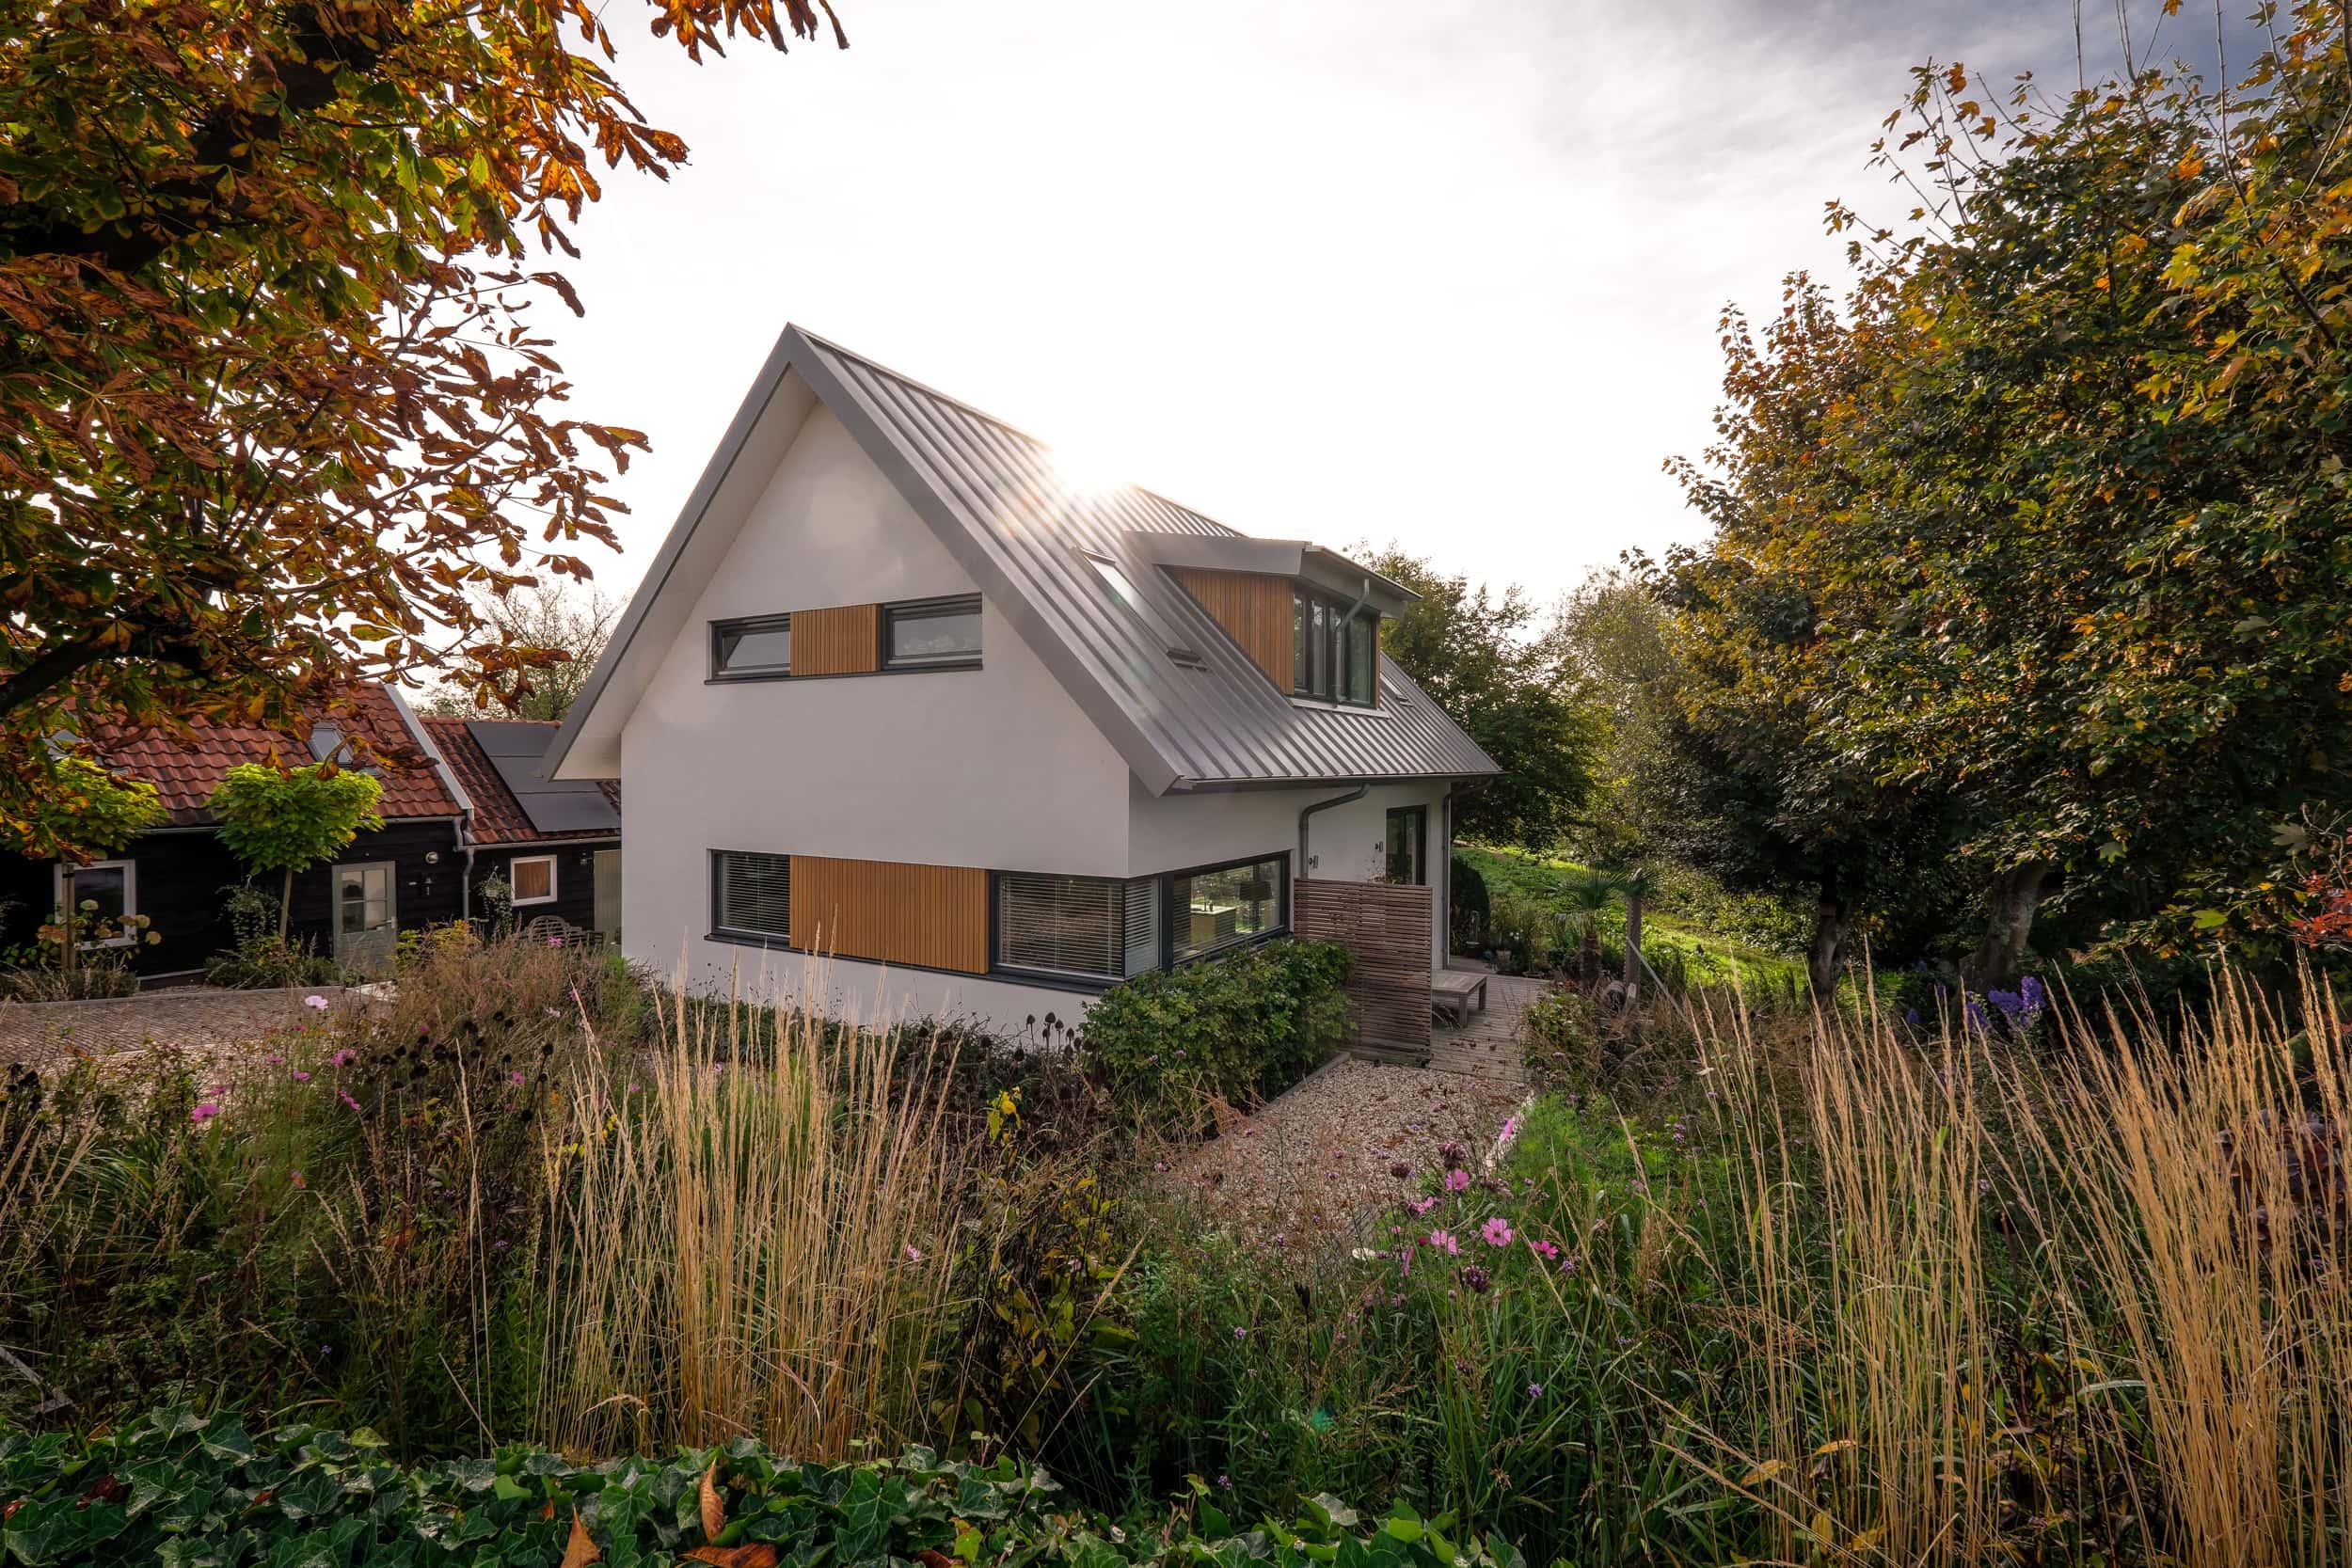 van-os-architecten-nieuwbouw-dijkwoning-rottekade-zevenhuizen-ochtendzon